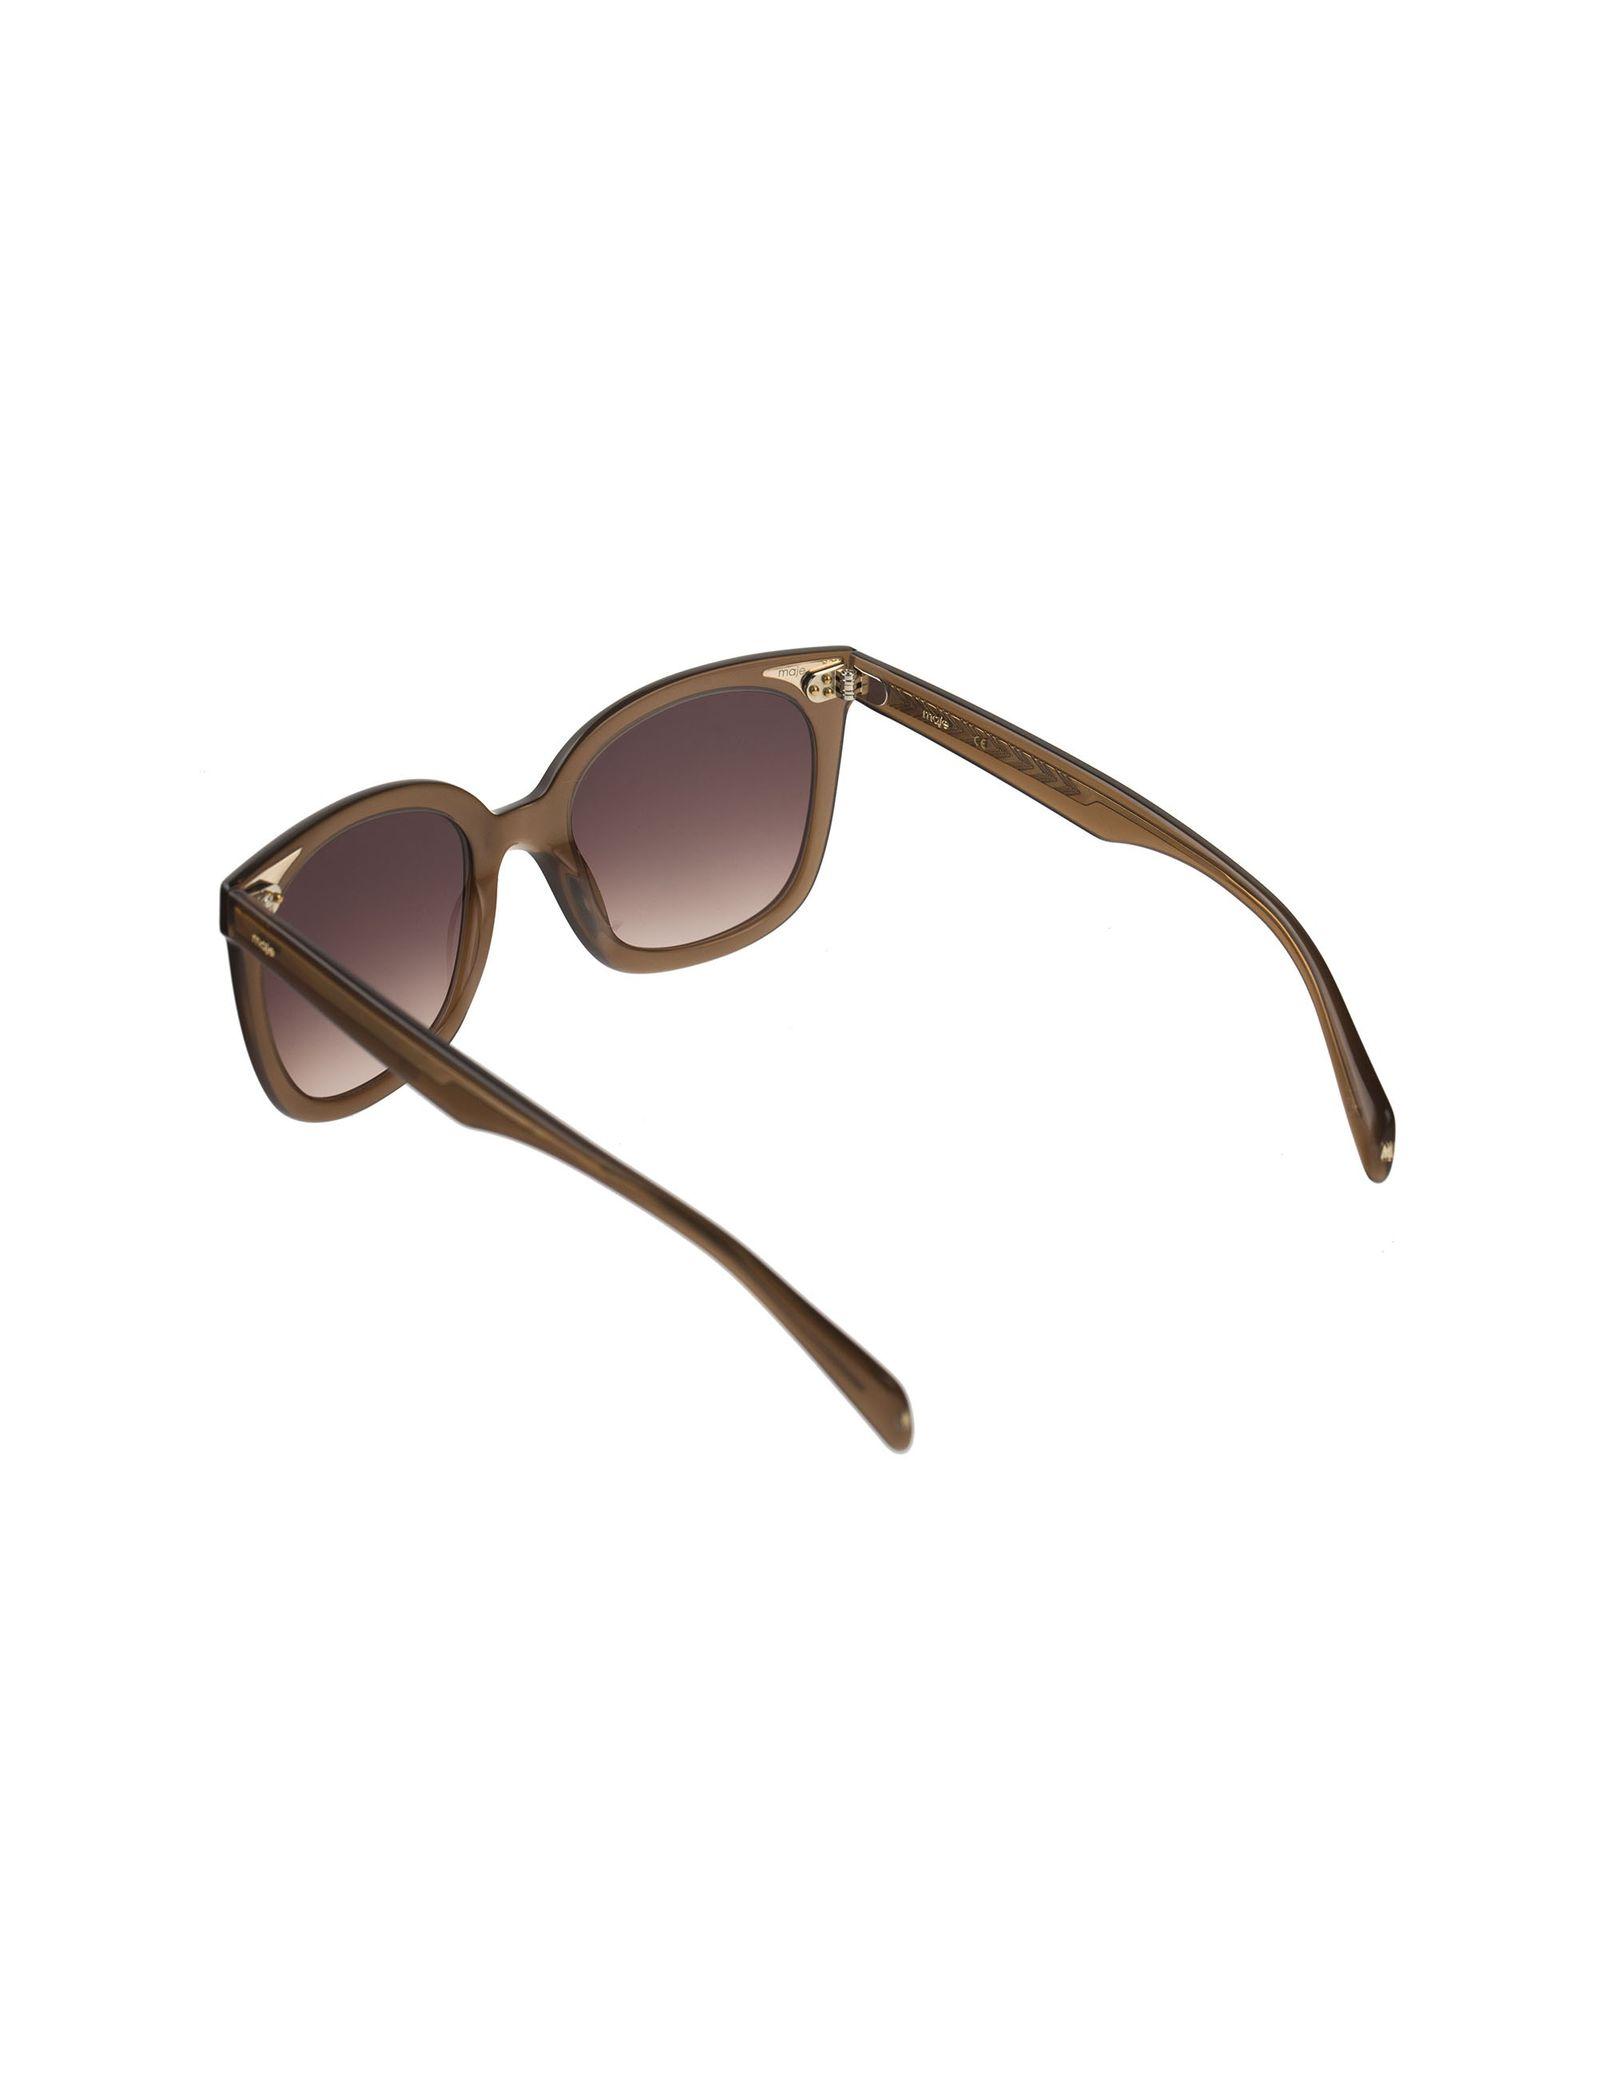 عینک آفتابی ویفرر زنانه - ماژ - قهوه اي - 4